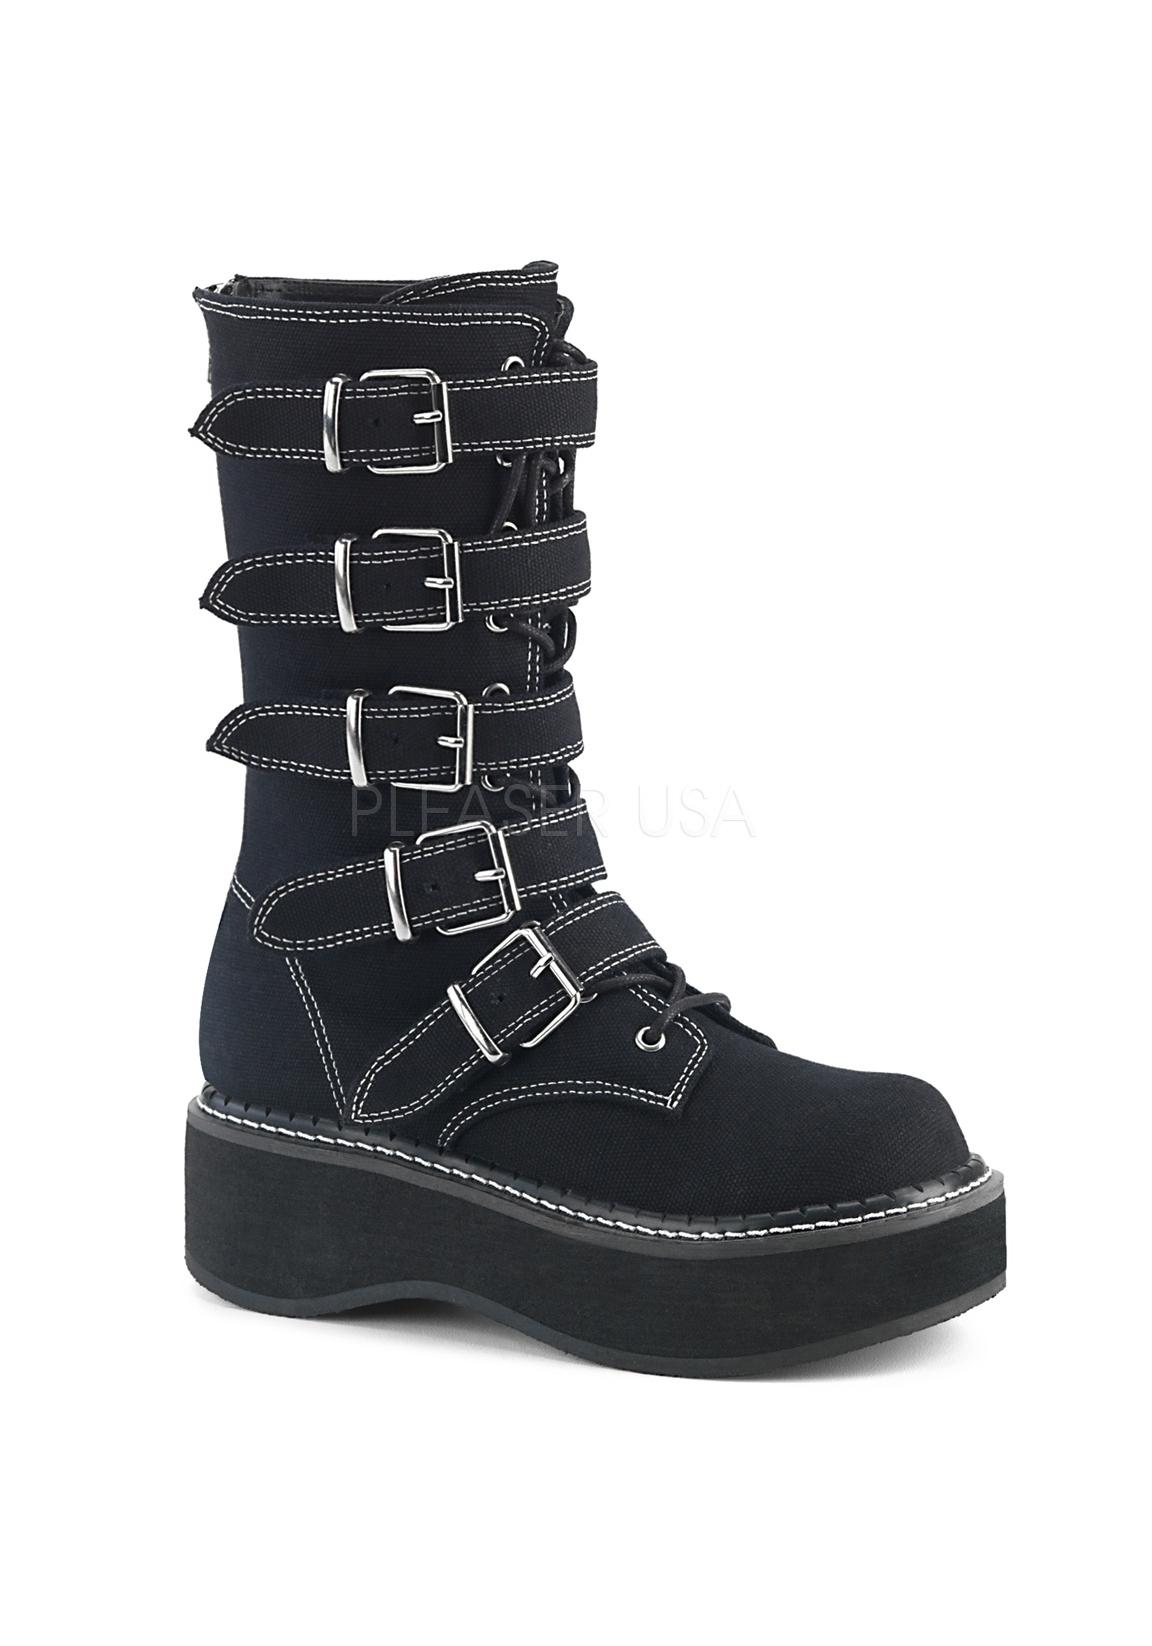 Demonia EMILY-341 2  Platform Mid-Calf Stiefel With 5 Buckle Straps, Metal Back Zip